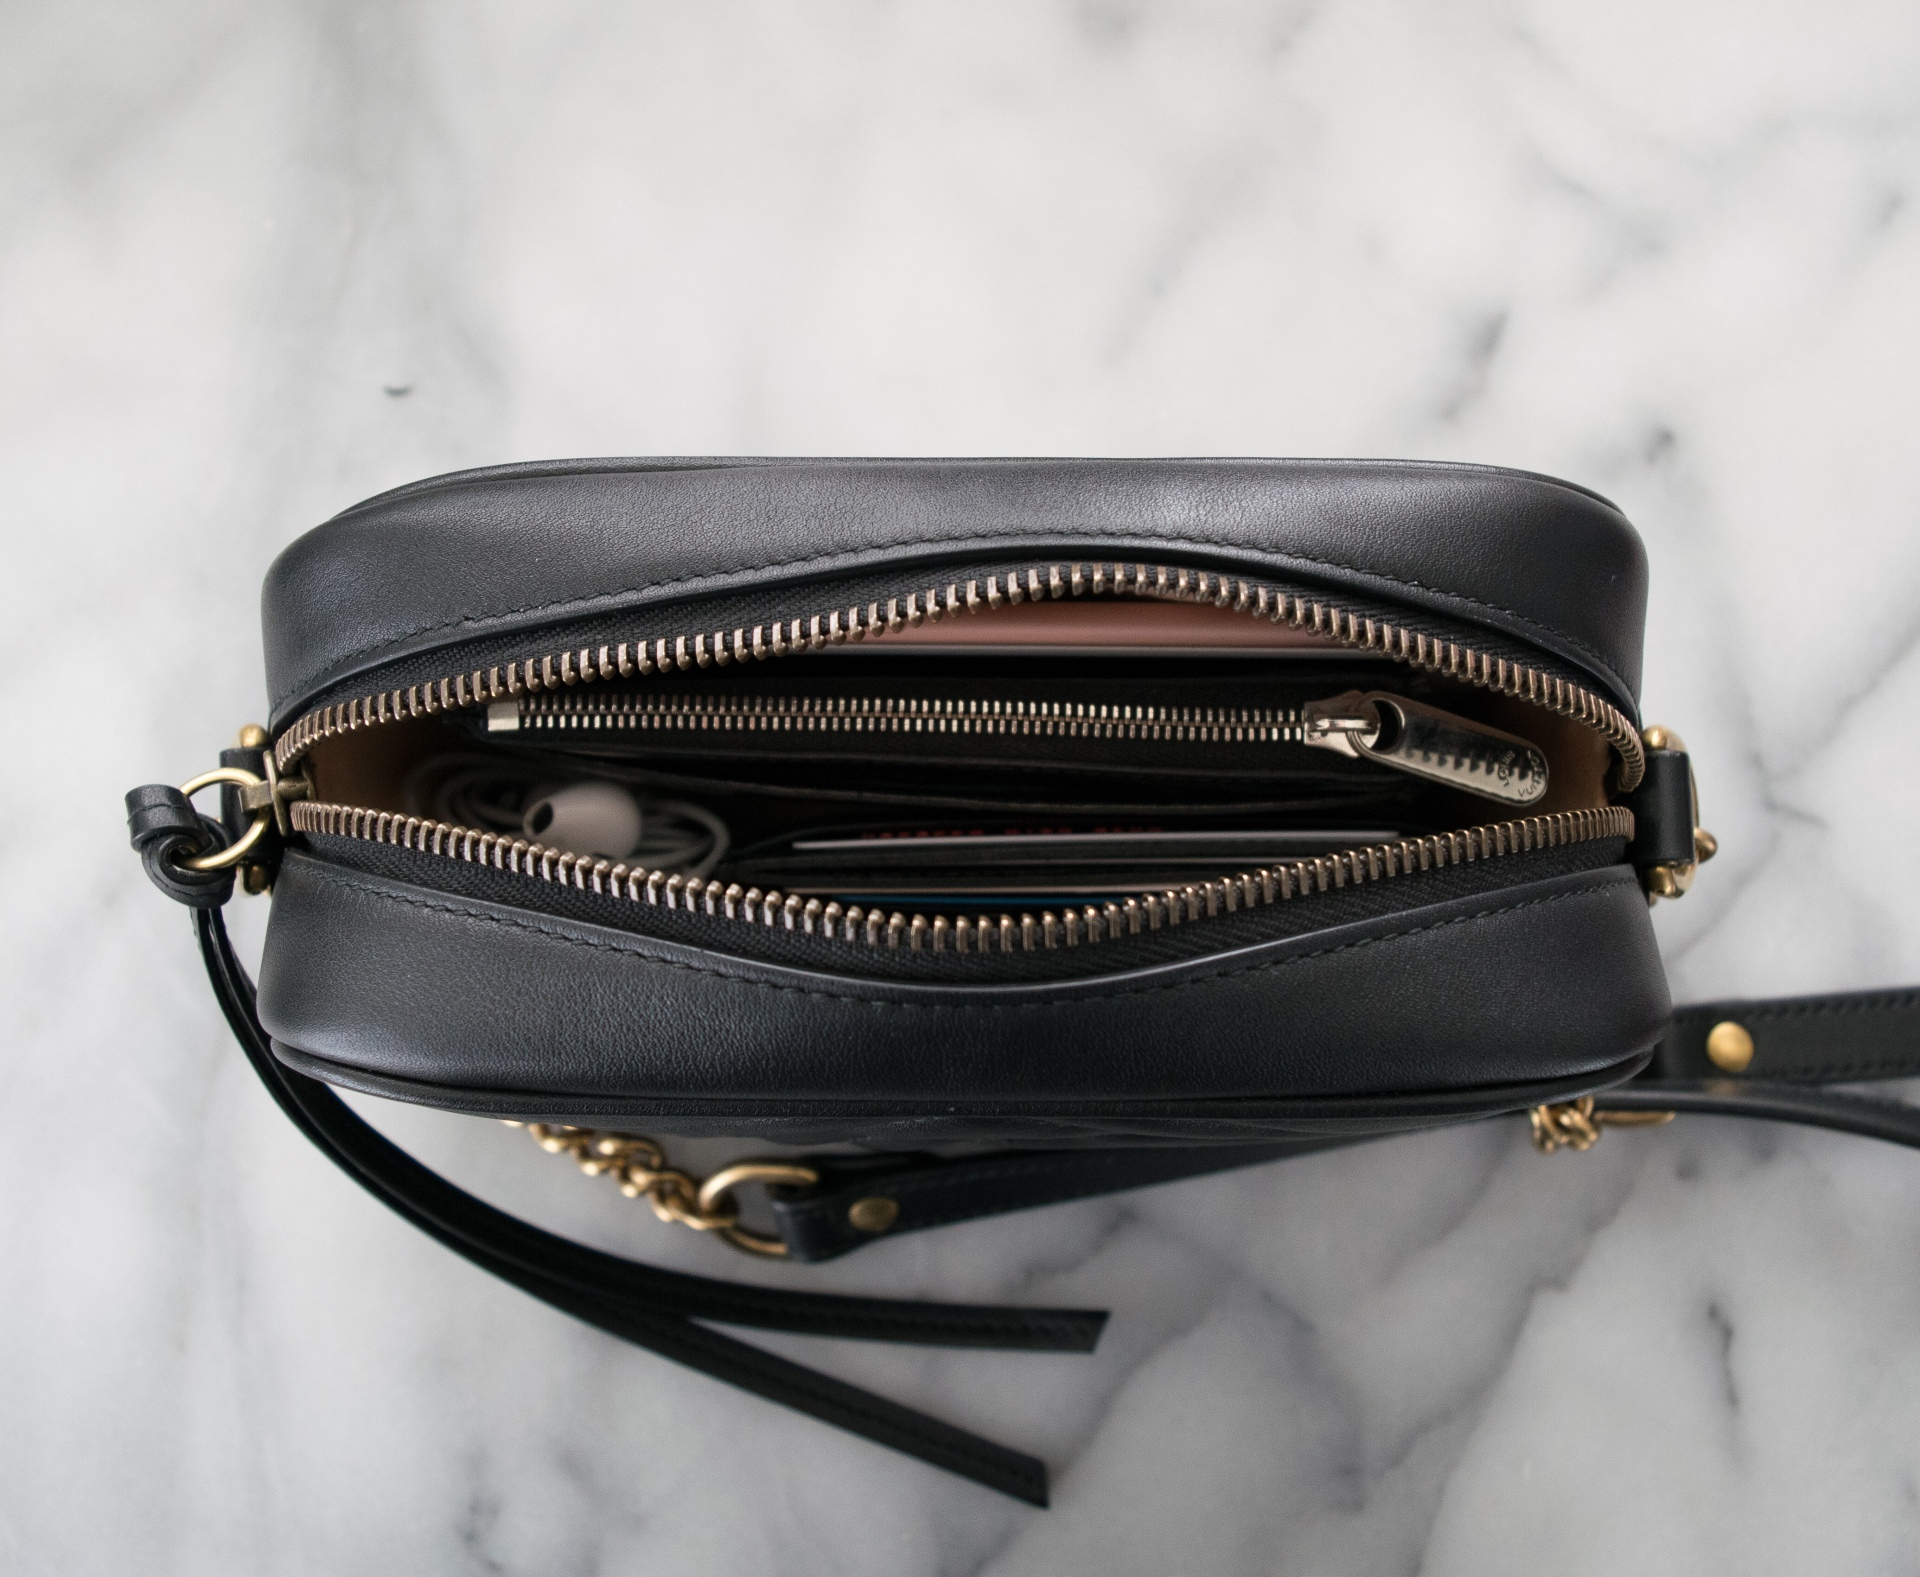 4b31e0b3b2d6 Size comparison: Gucci Marmont Mini Camera Bag versus Louis Vuitton  Favorite PM and YSL Chain Wallet